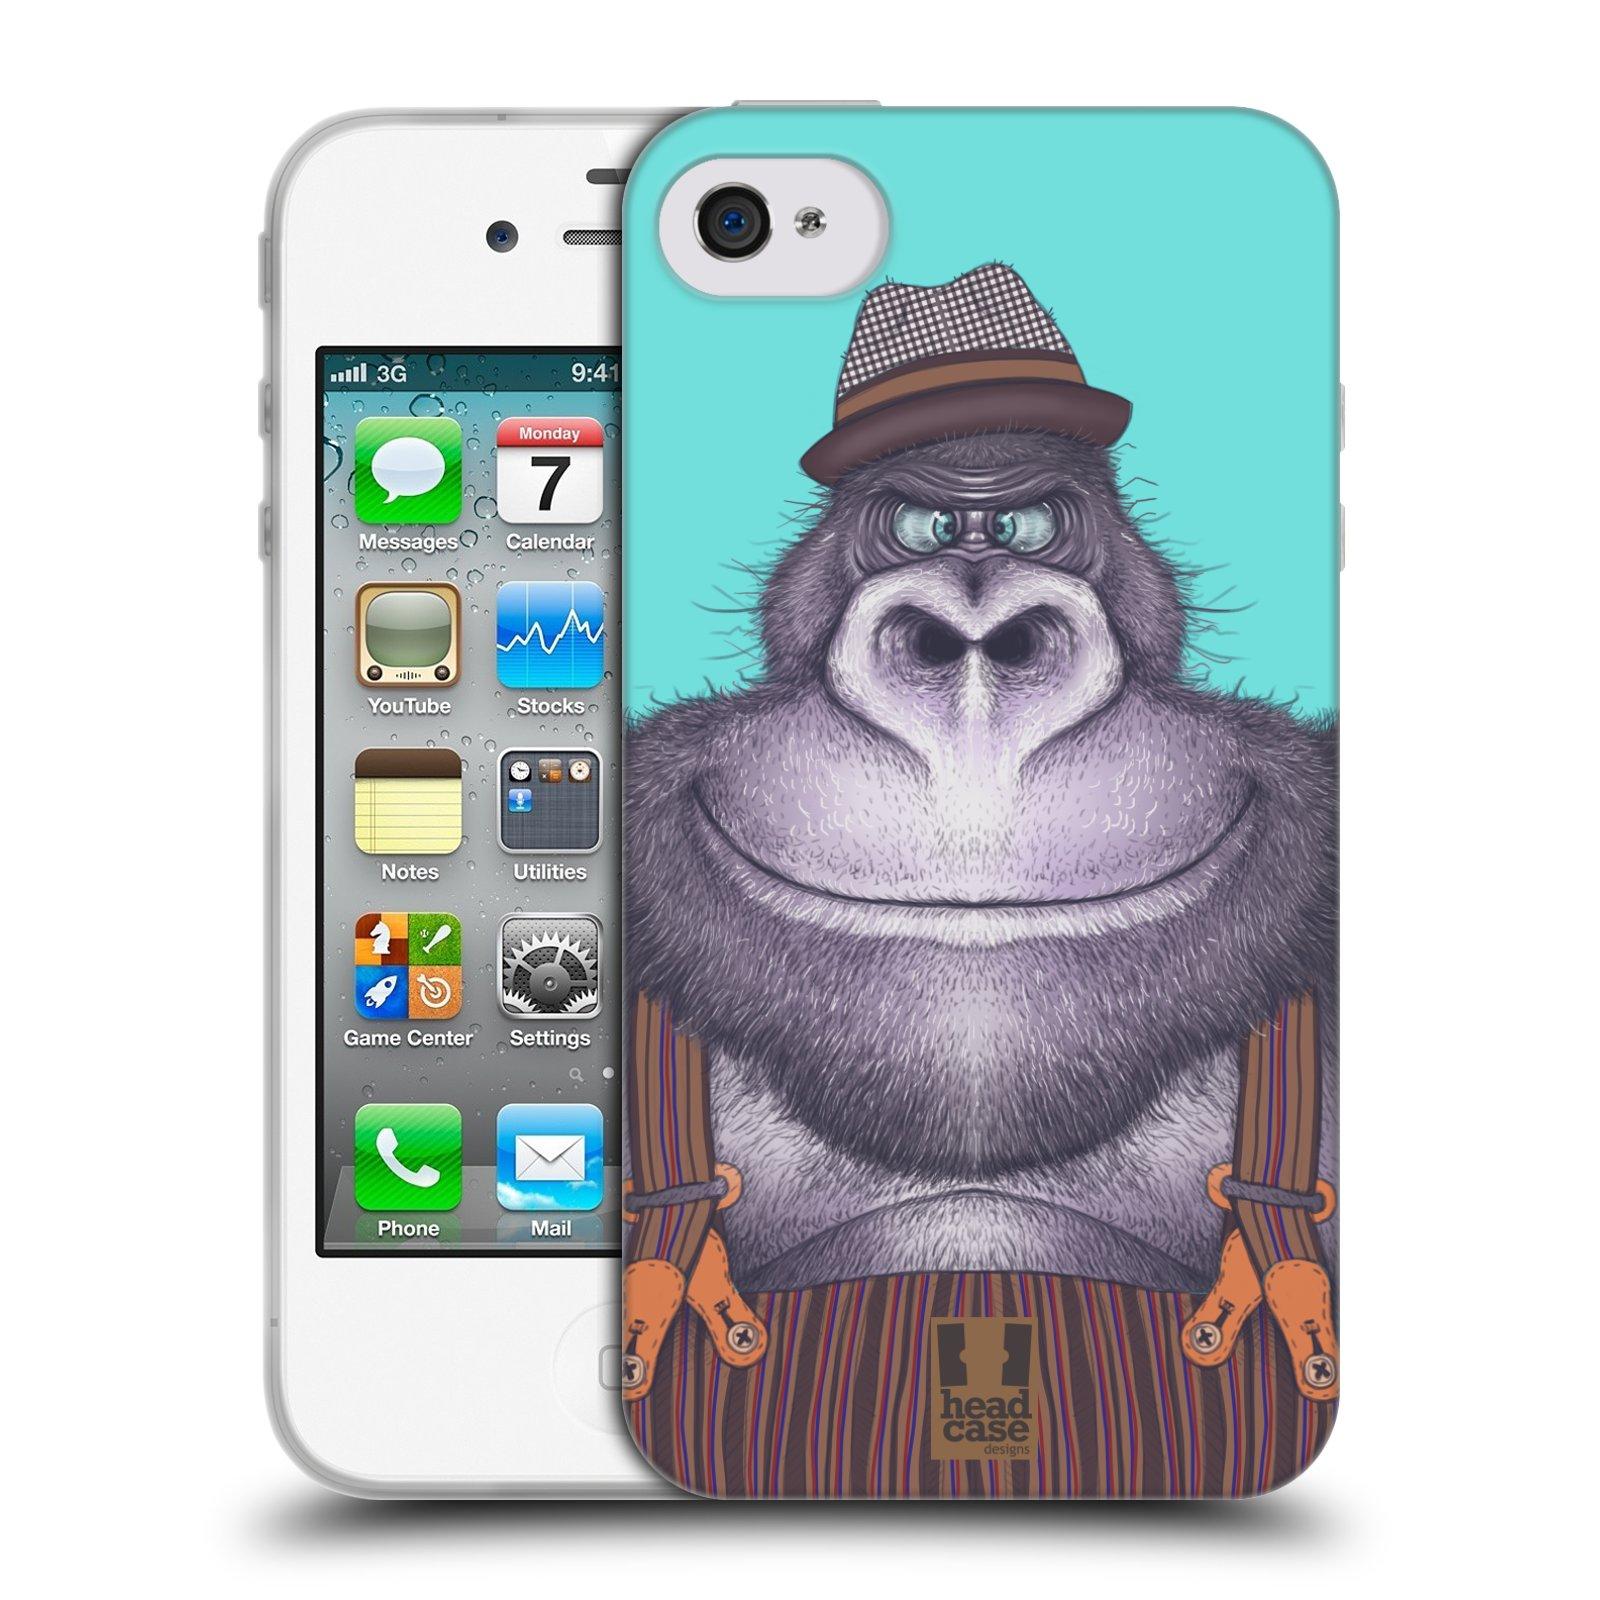 HEAD CASE silikonový obal na mobil Apple Iphone 4/4S vzor Kreslená zvířátka gorila